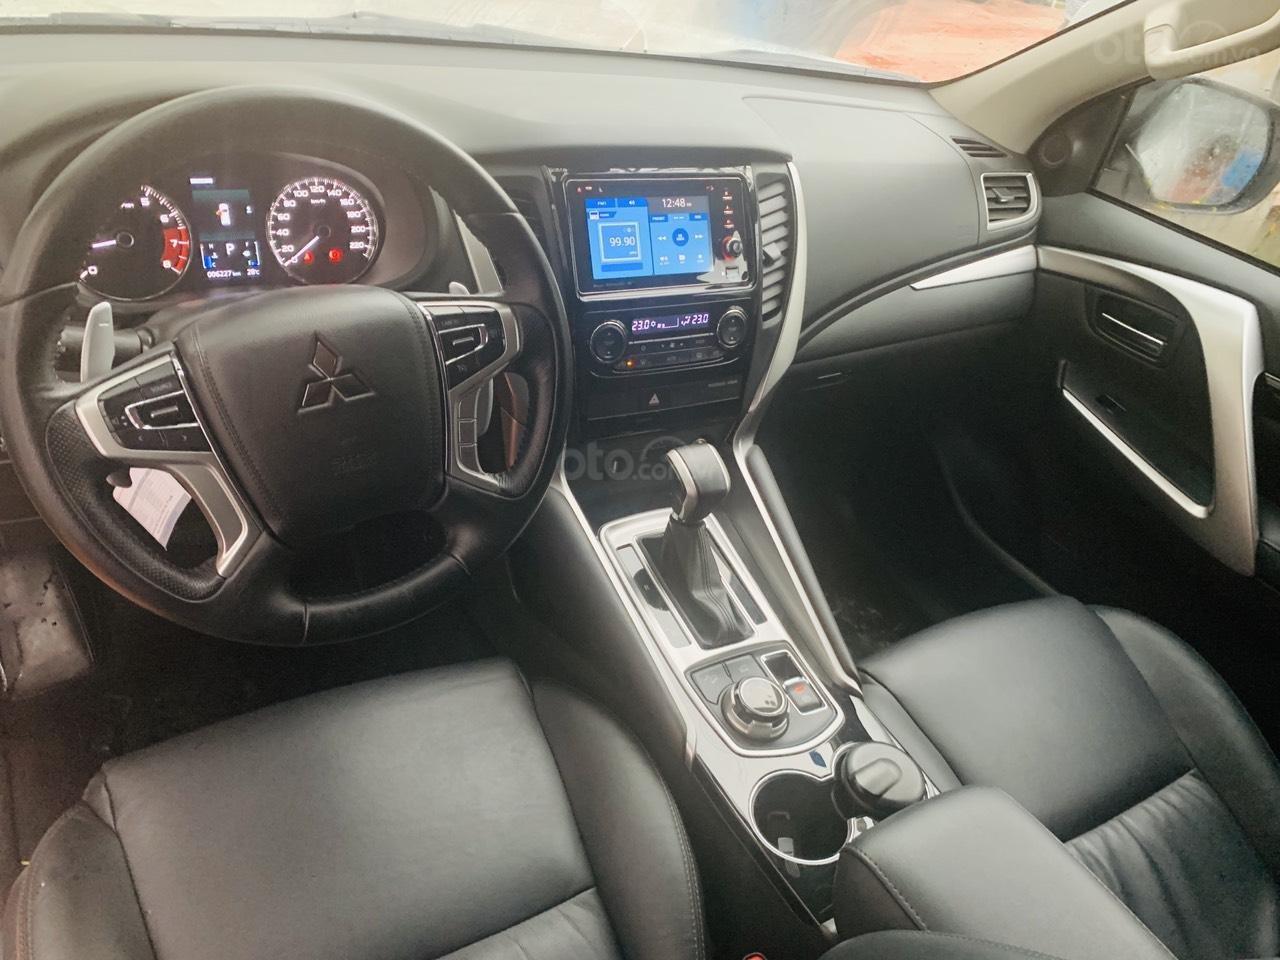 Mitsubishi Pajero Sport 3.0G 4x4 AT 2018, chạy 6.500 km (7)